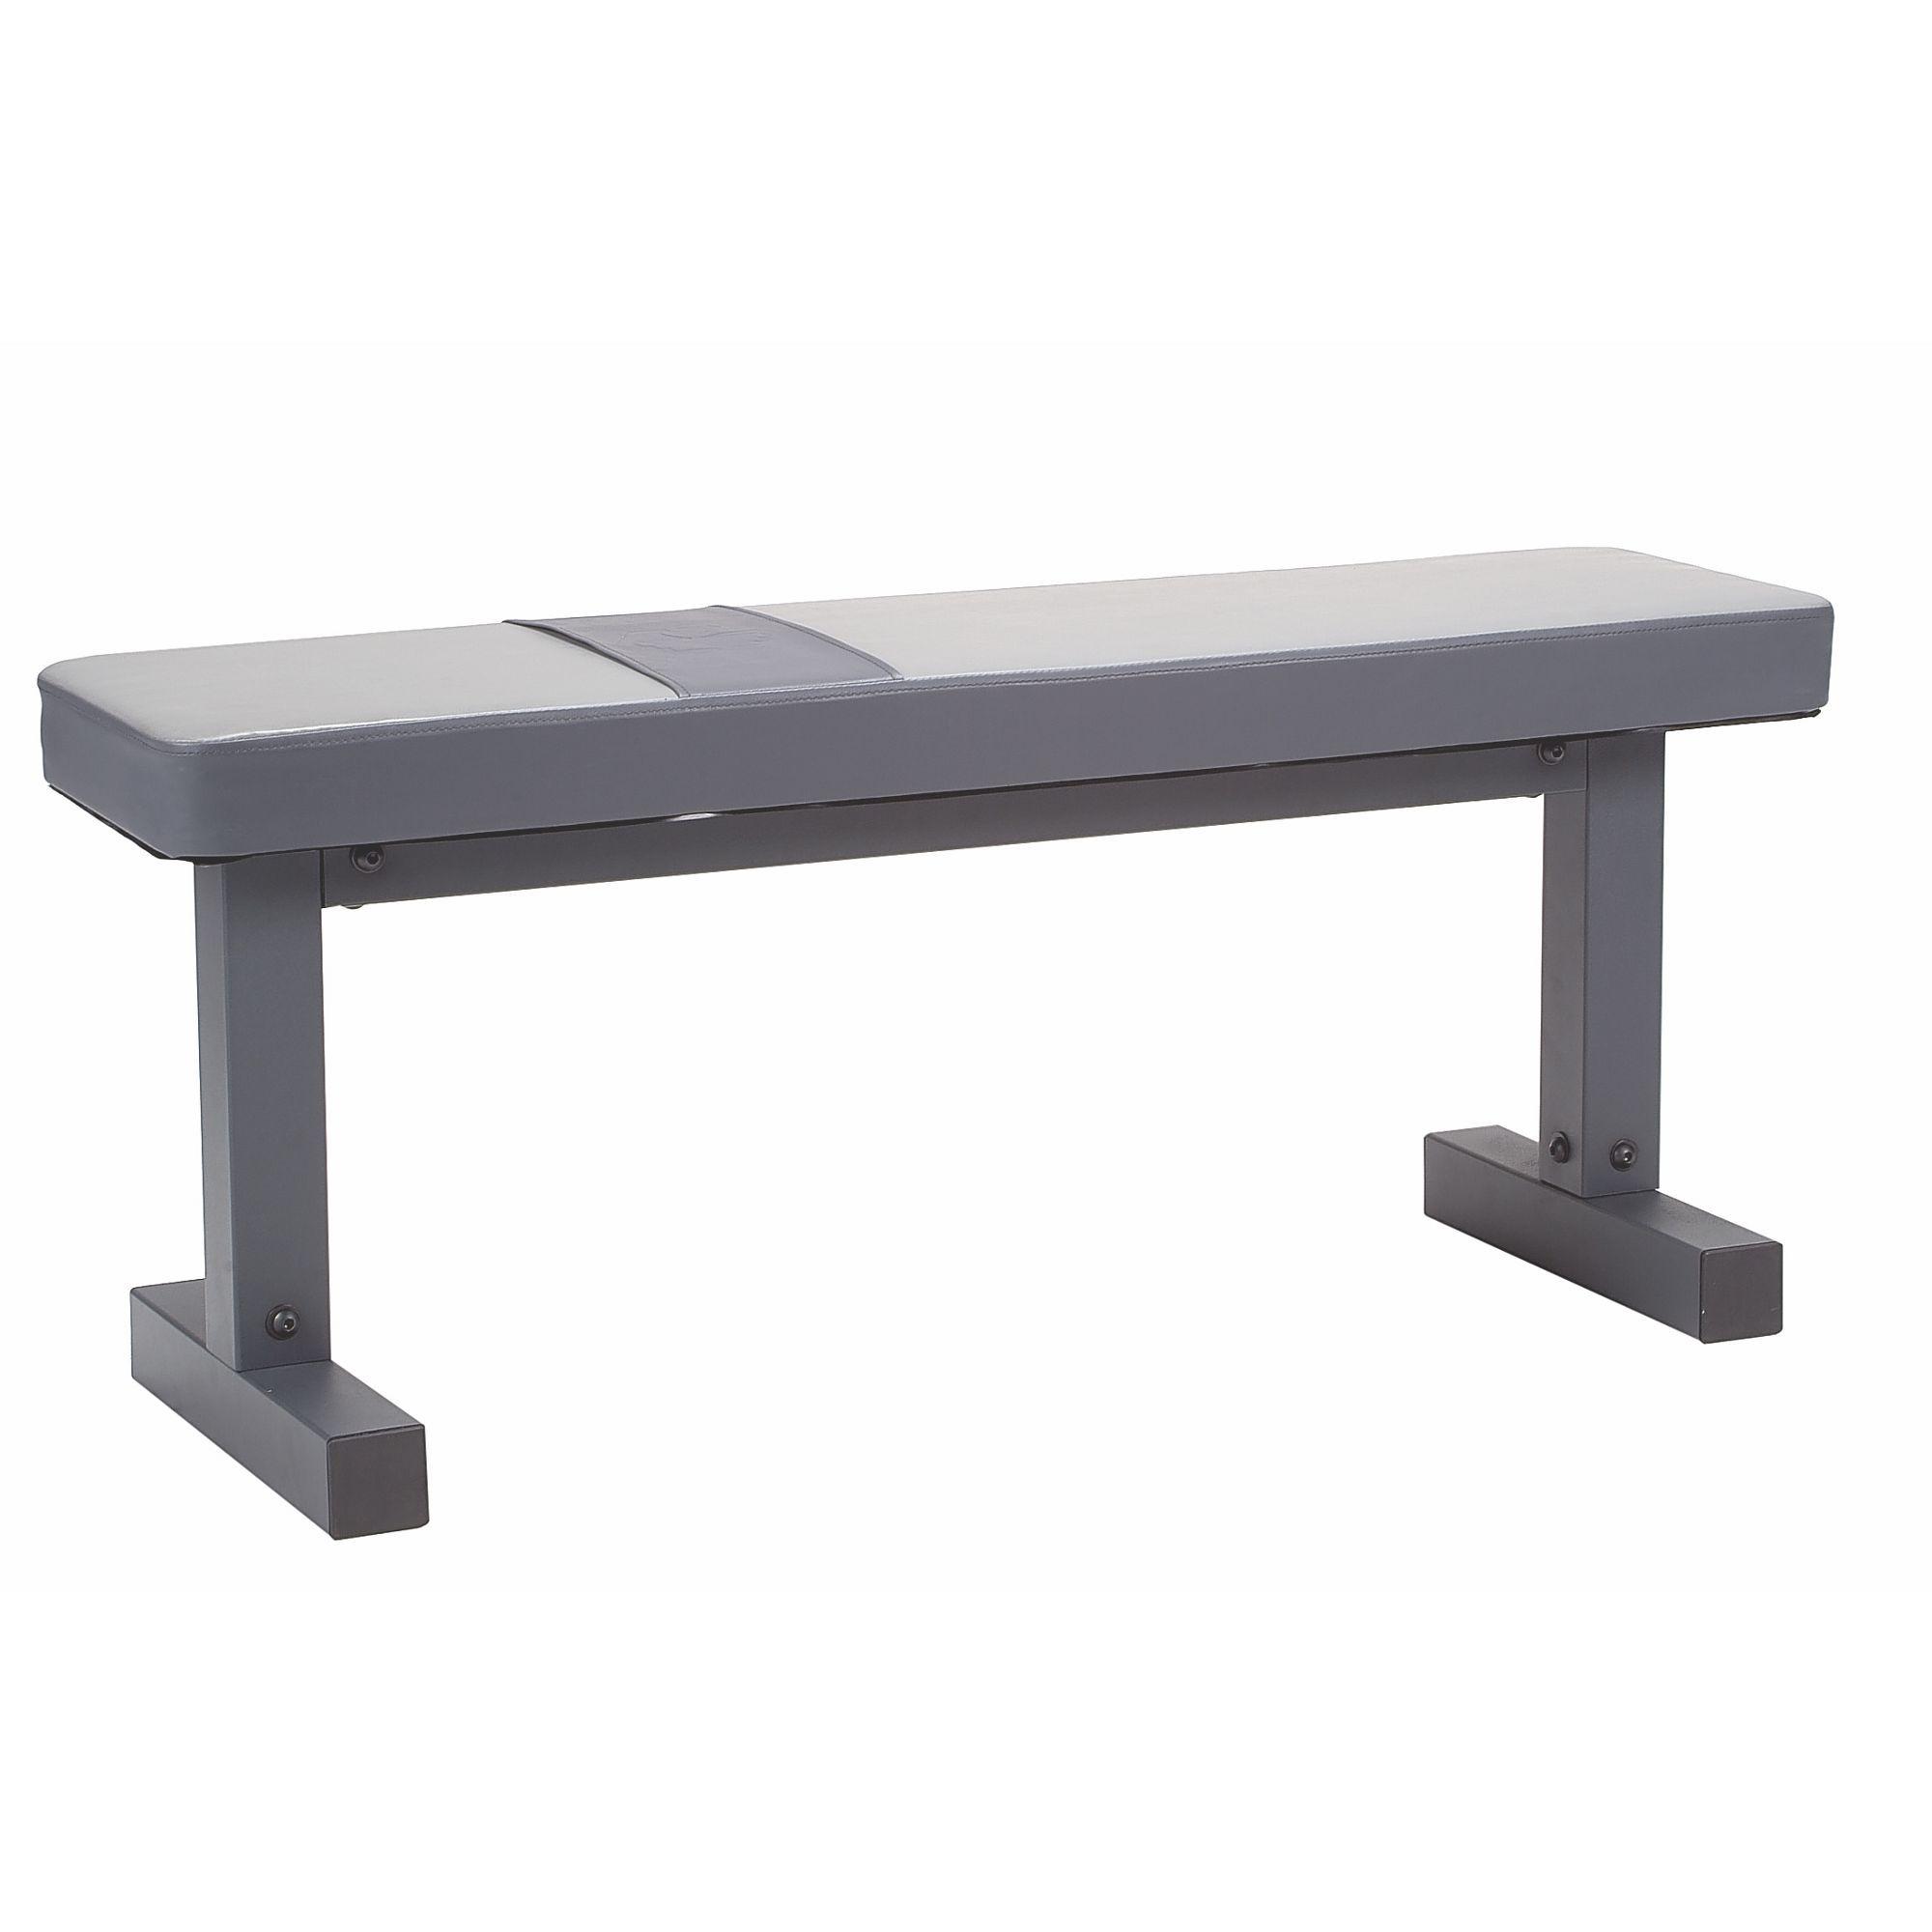 Marcy Jd2 1 Flat Bench